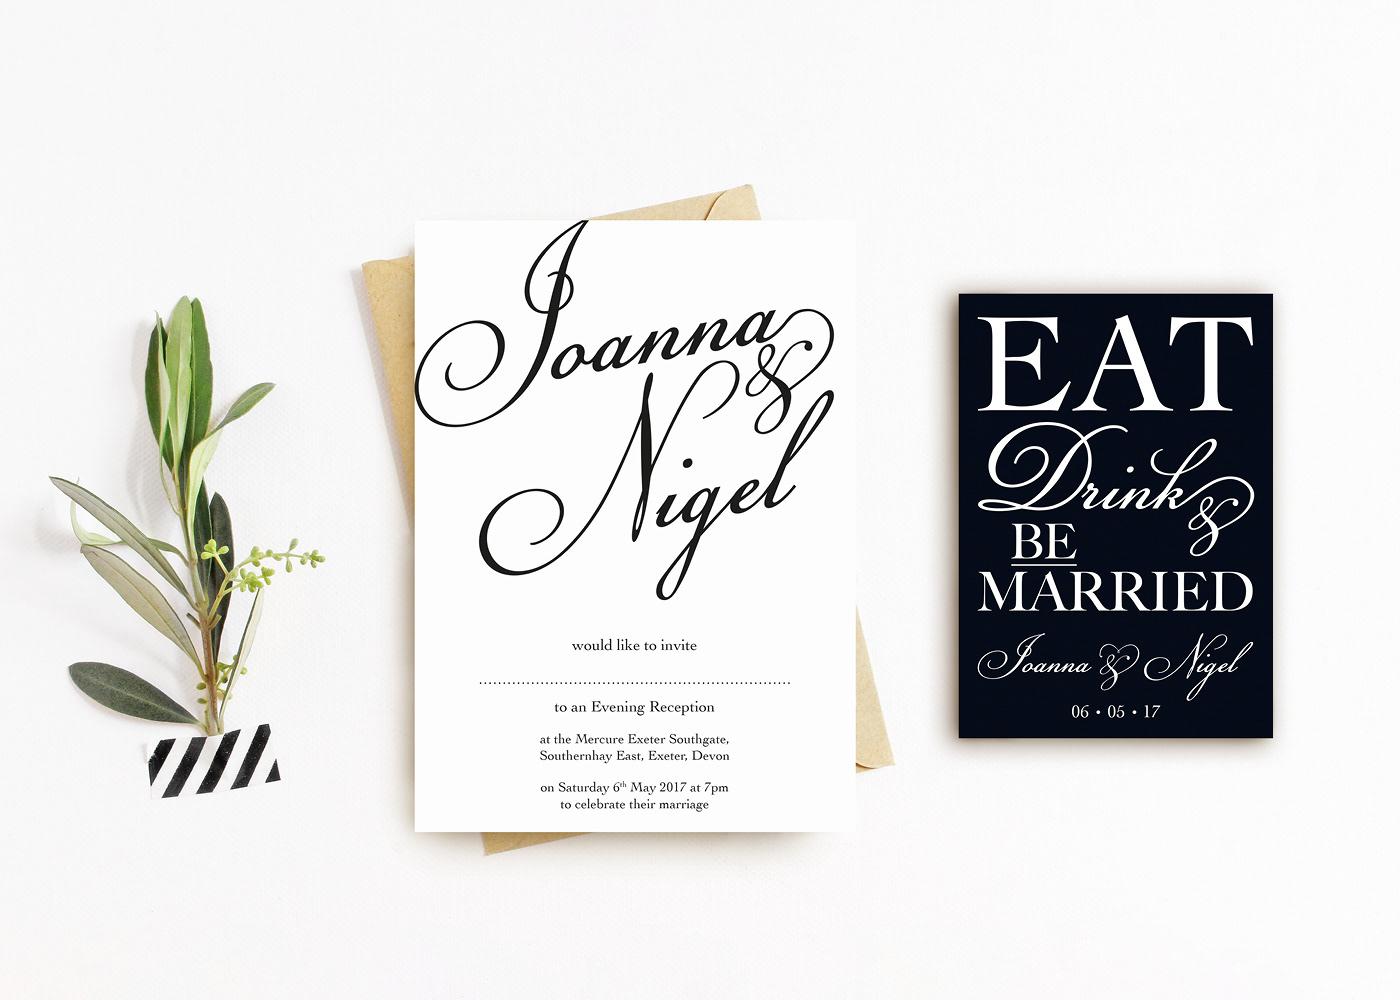 wedding invitations wedding invitation invite Stationery suite ILLUSTRATION  typography   graphic design  print design